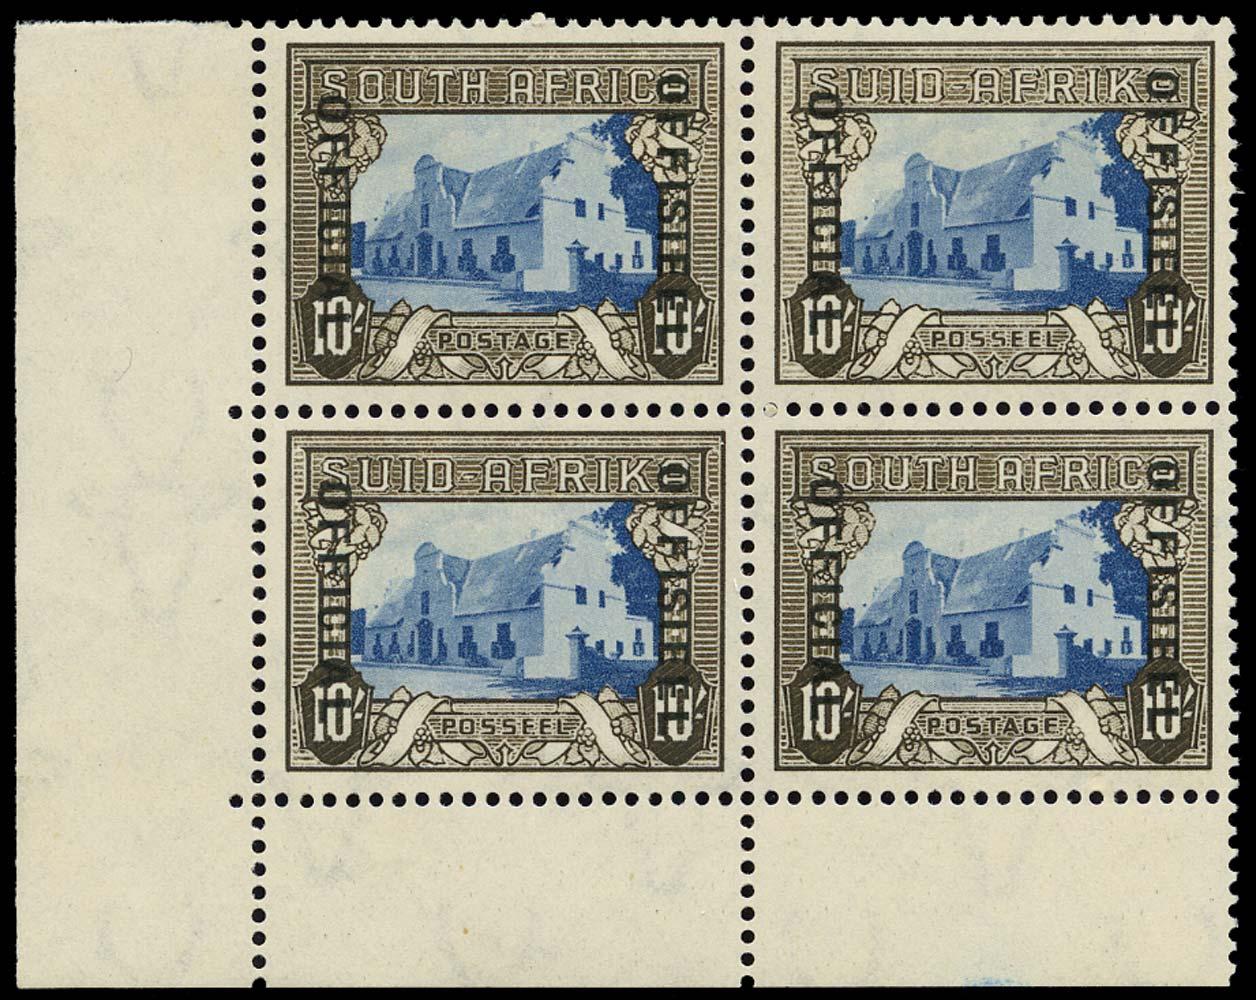 SOUTH AFRICA 1935  SGO29 Official